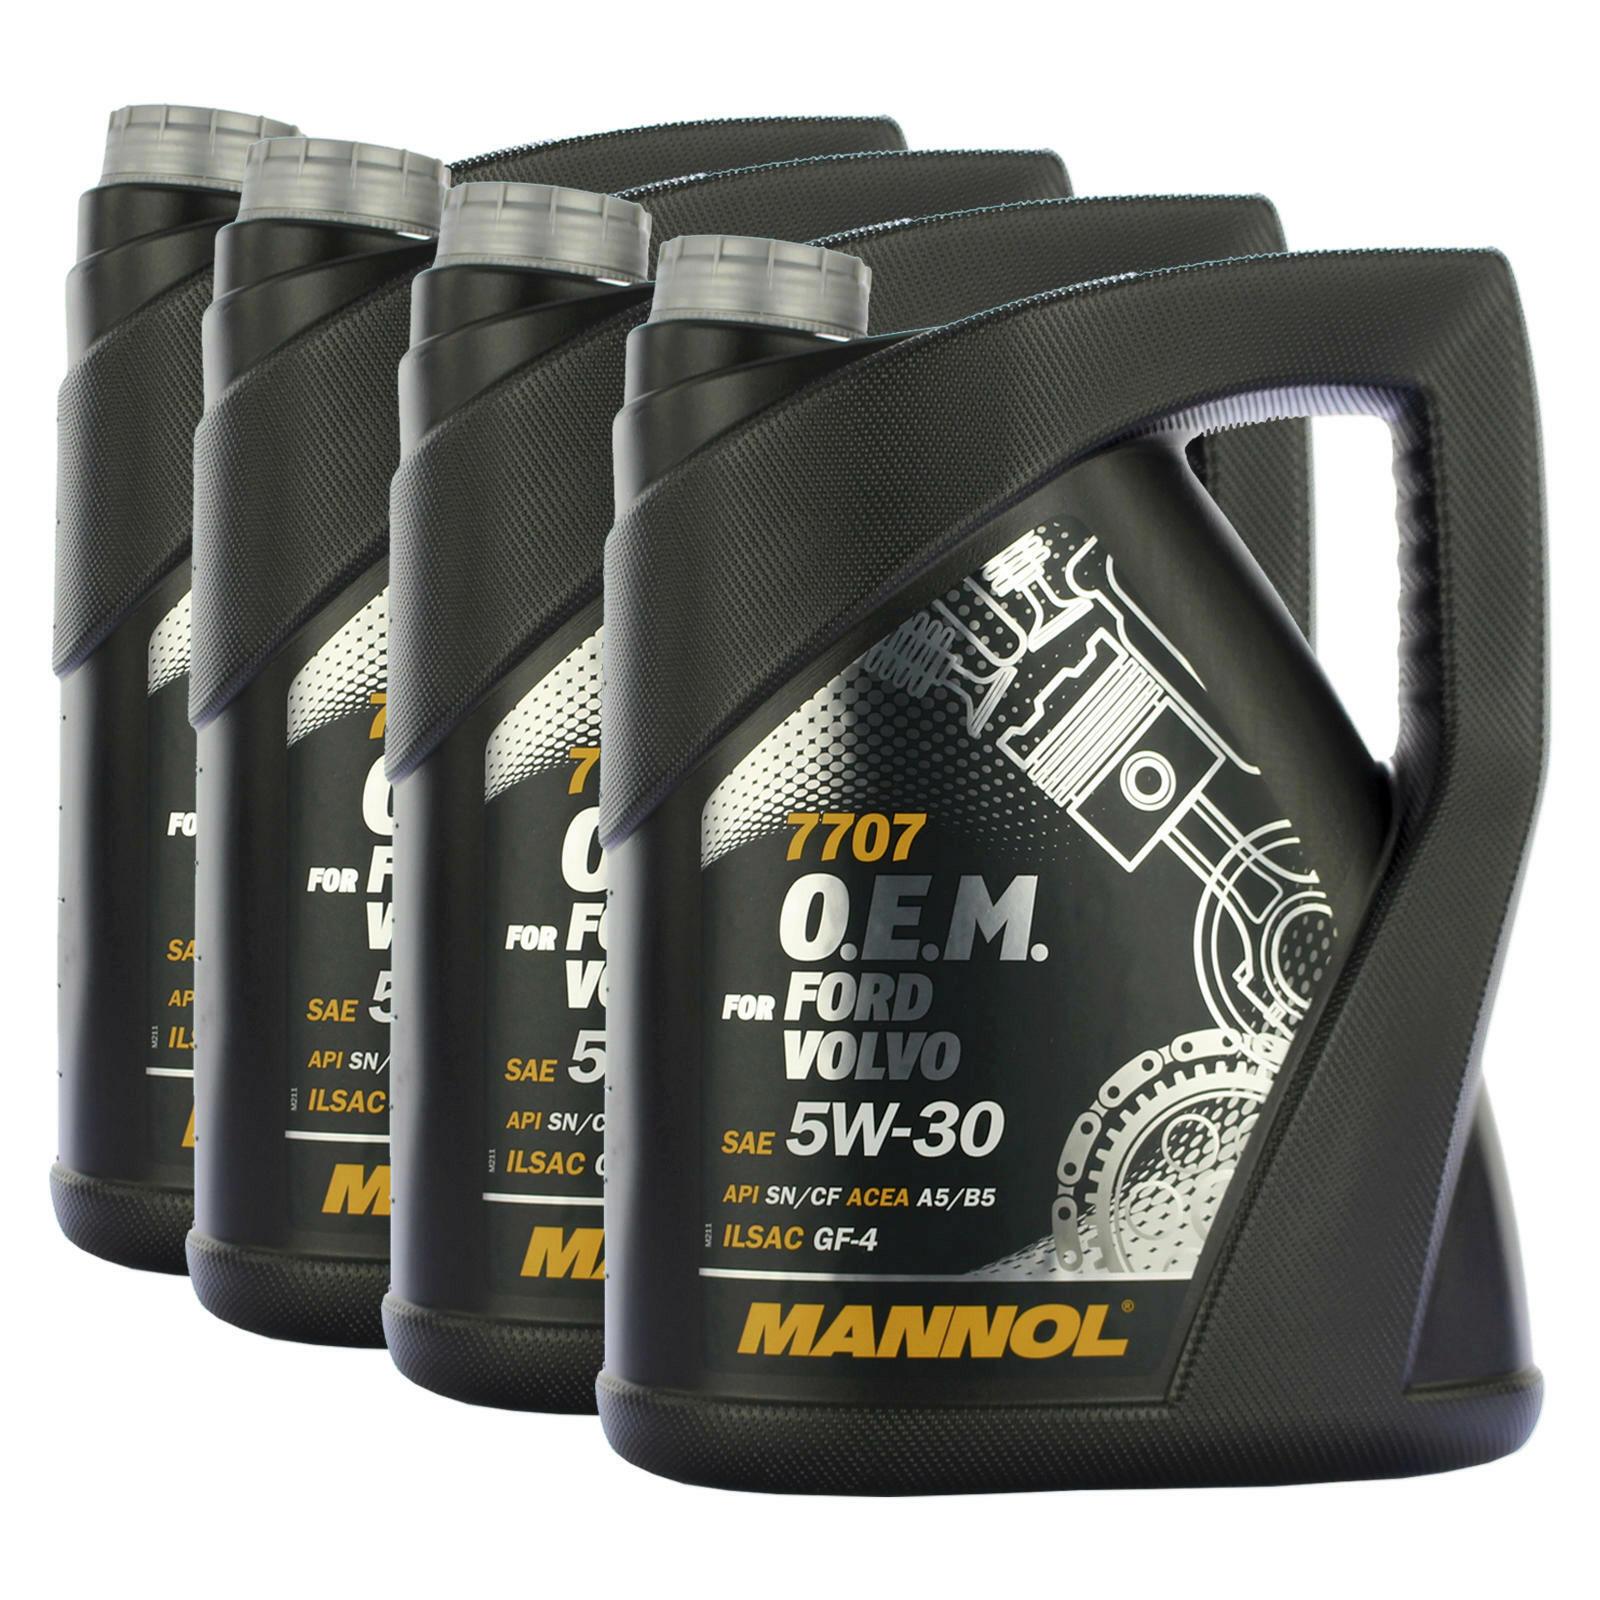 4x 5 Liter MANNOL Motoröl 5W-30 7707 O.E.M. FORD OPEL VOLVO API SN/CF